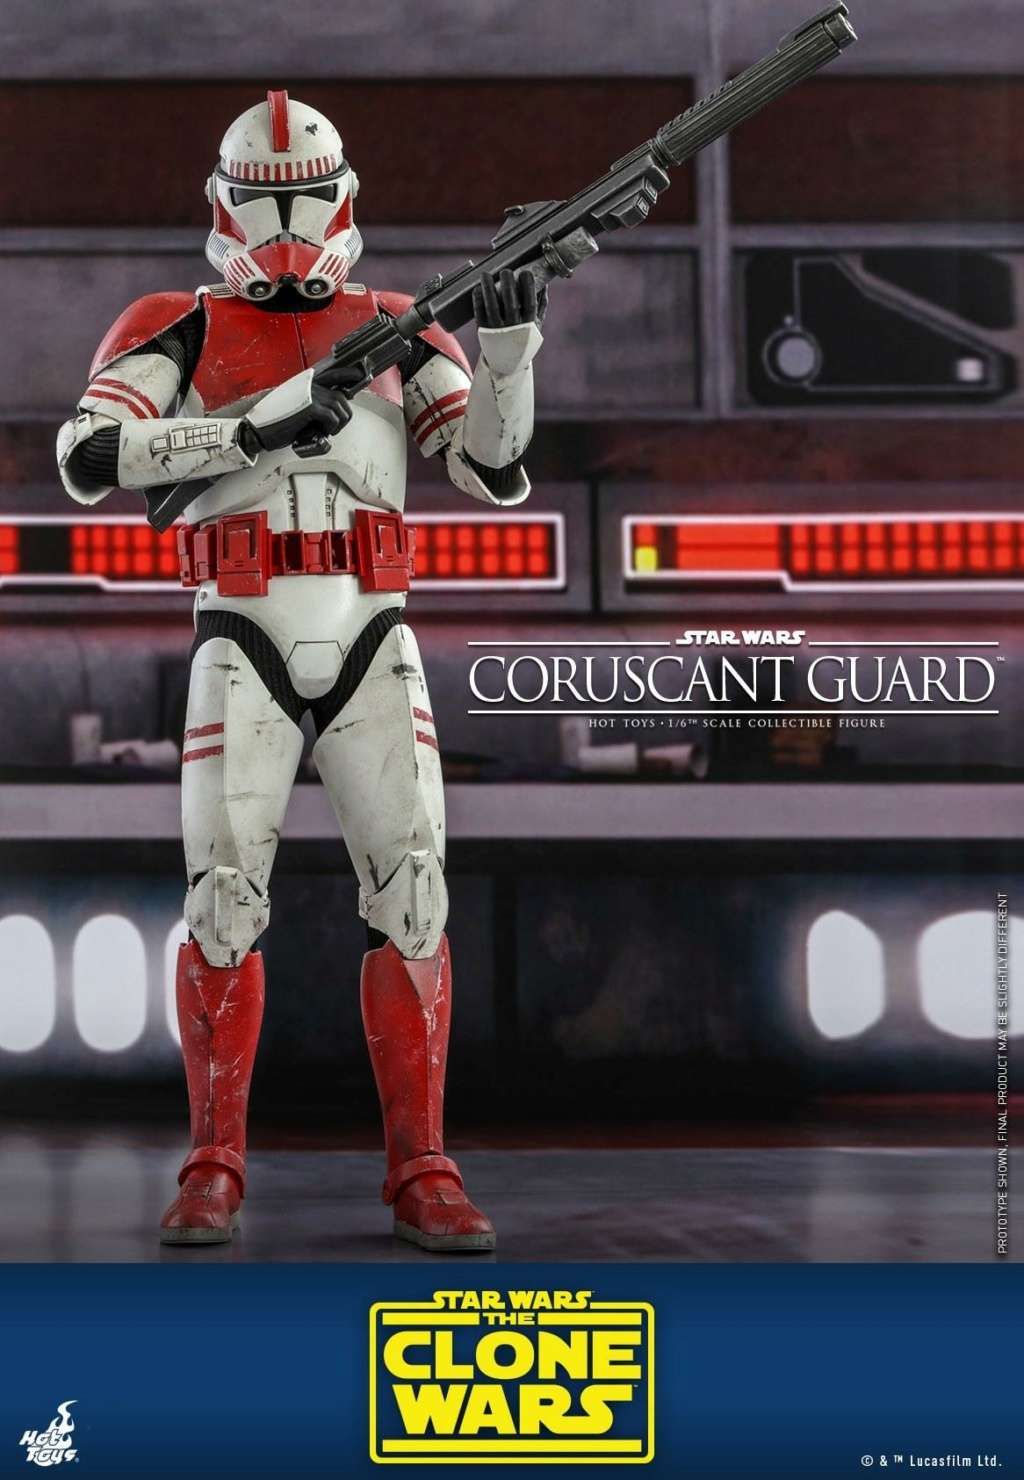 Coruscant Guard - 1/6th Figure - The Clone Wars - Hot Toys Corusc10